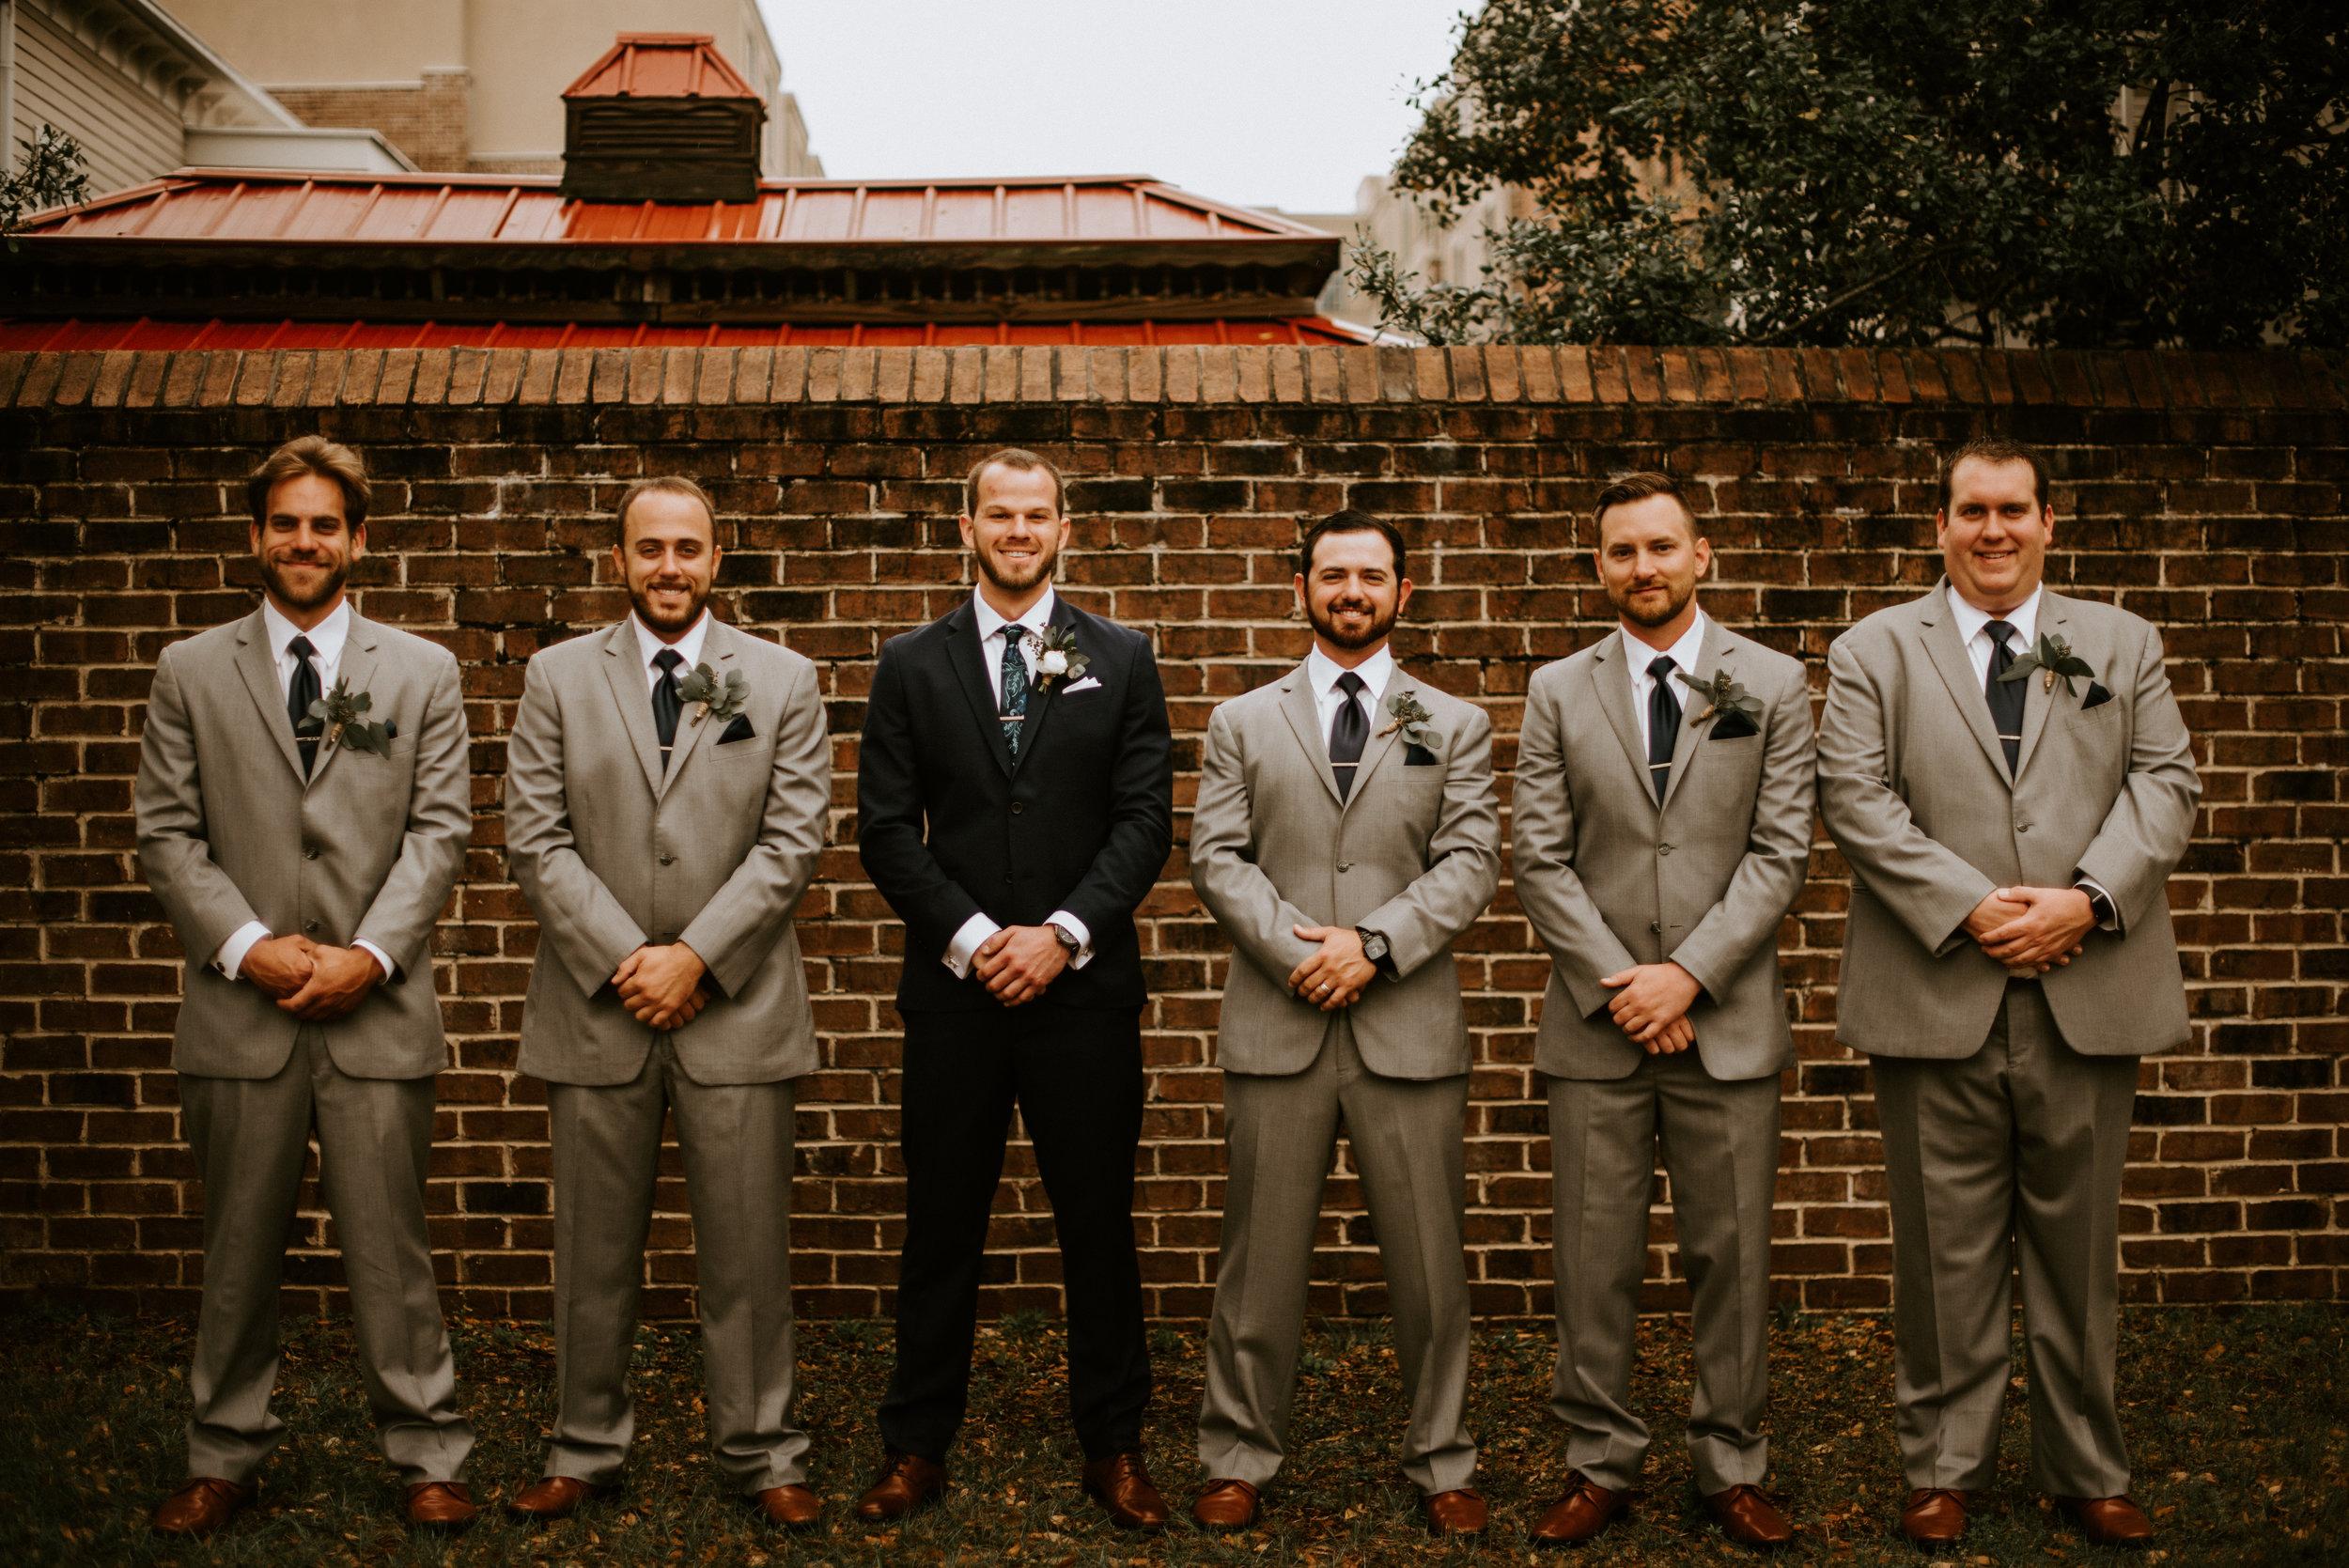 savannah-bridal-shop-andrea-and-mike-evergold-photography-georgia-state-railroad-museum-wedding-savannah-wedding-florist-savannah-wedding-planner-5.jpg